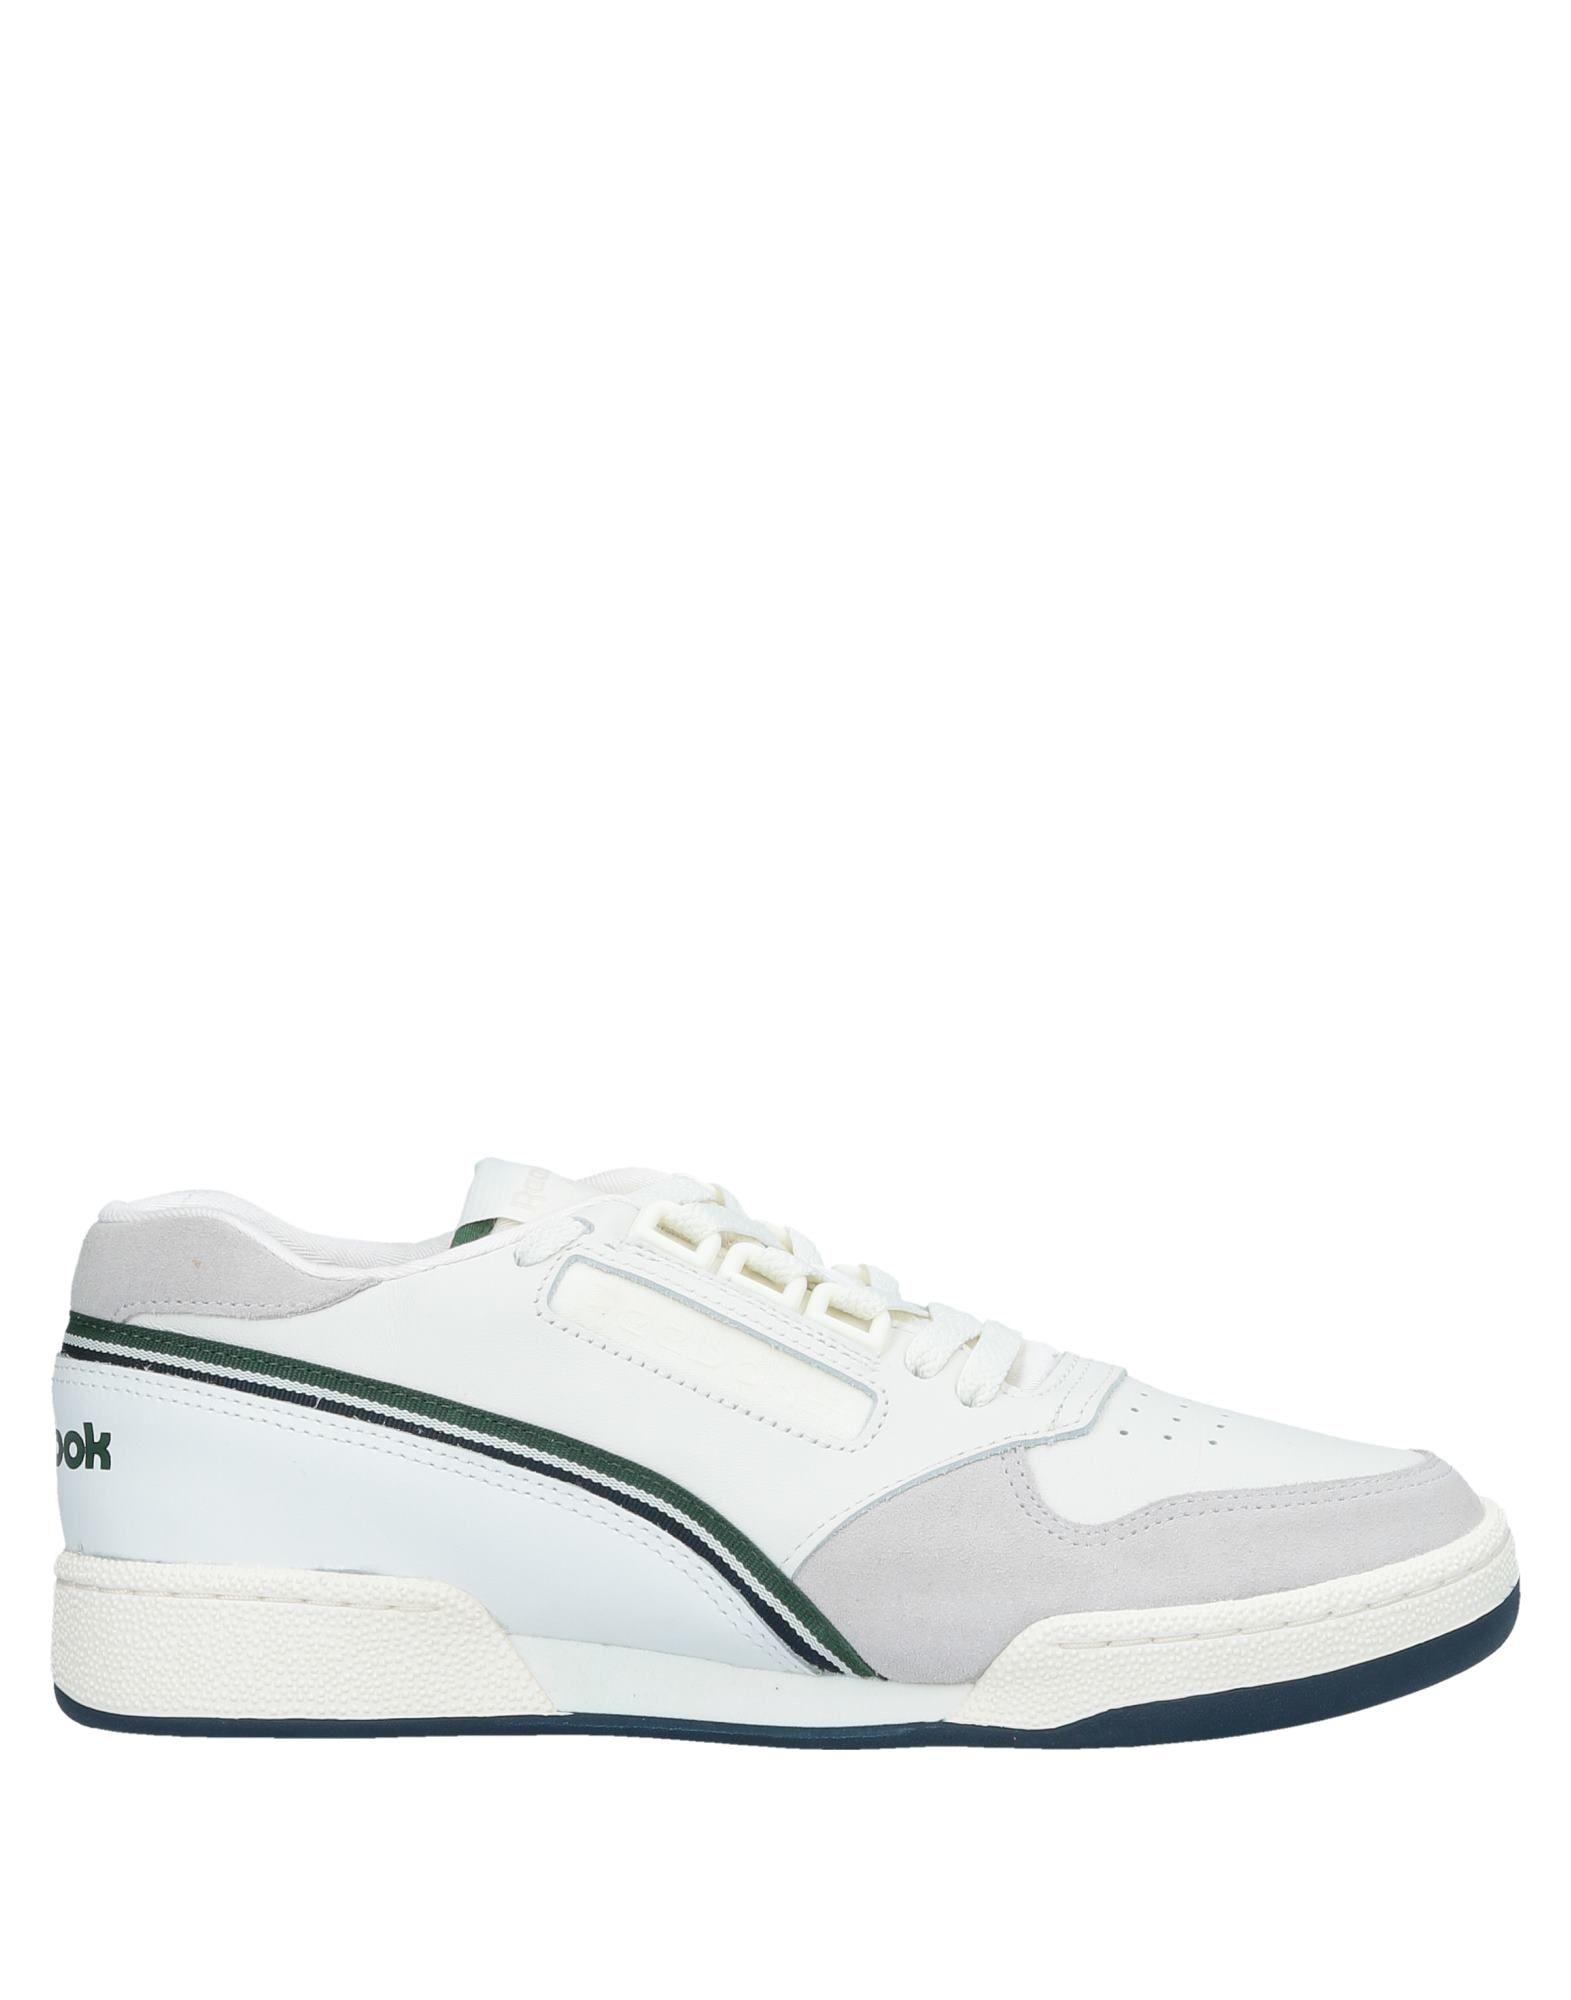 Reebok Sneakers Sneakers - Men Reebok Sneakers Reebok online on  United Kingdom - 11532933CI b8e4d1